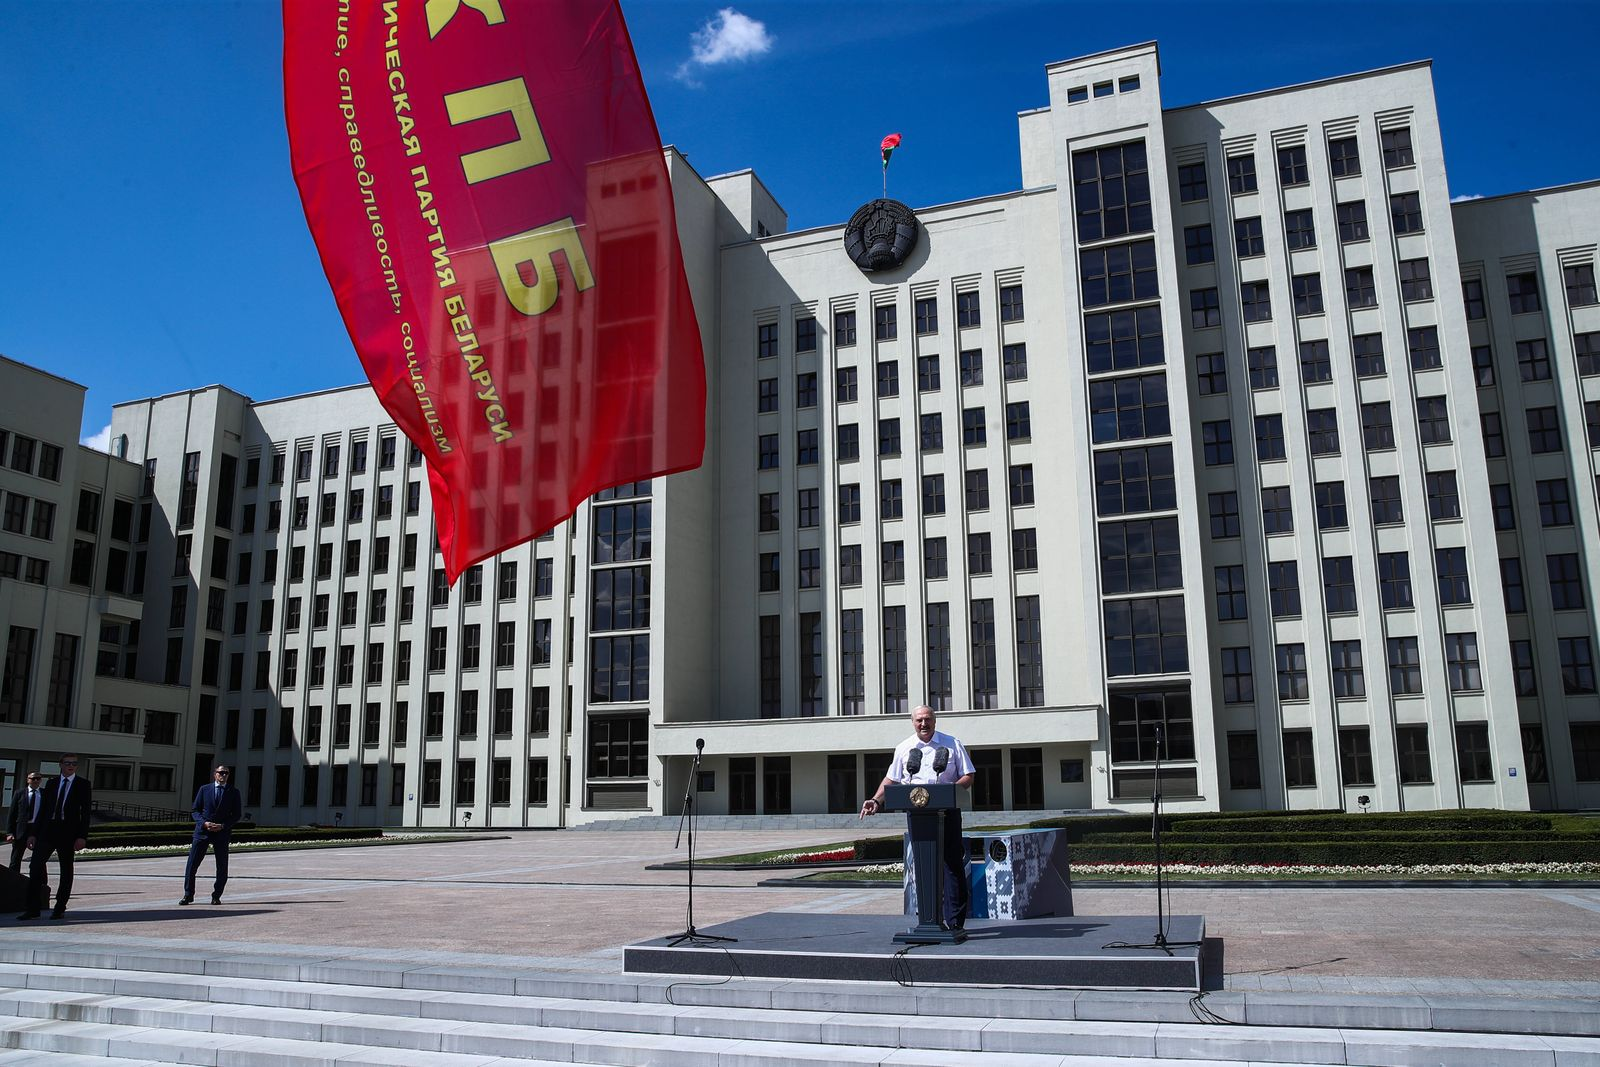 MINSK, BELARUS - AUGUST 16, 2020: Belarus President Alexander Lukashenko speaks during a rally of his supporters in Inde